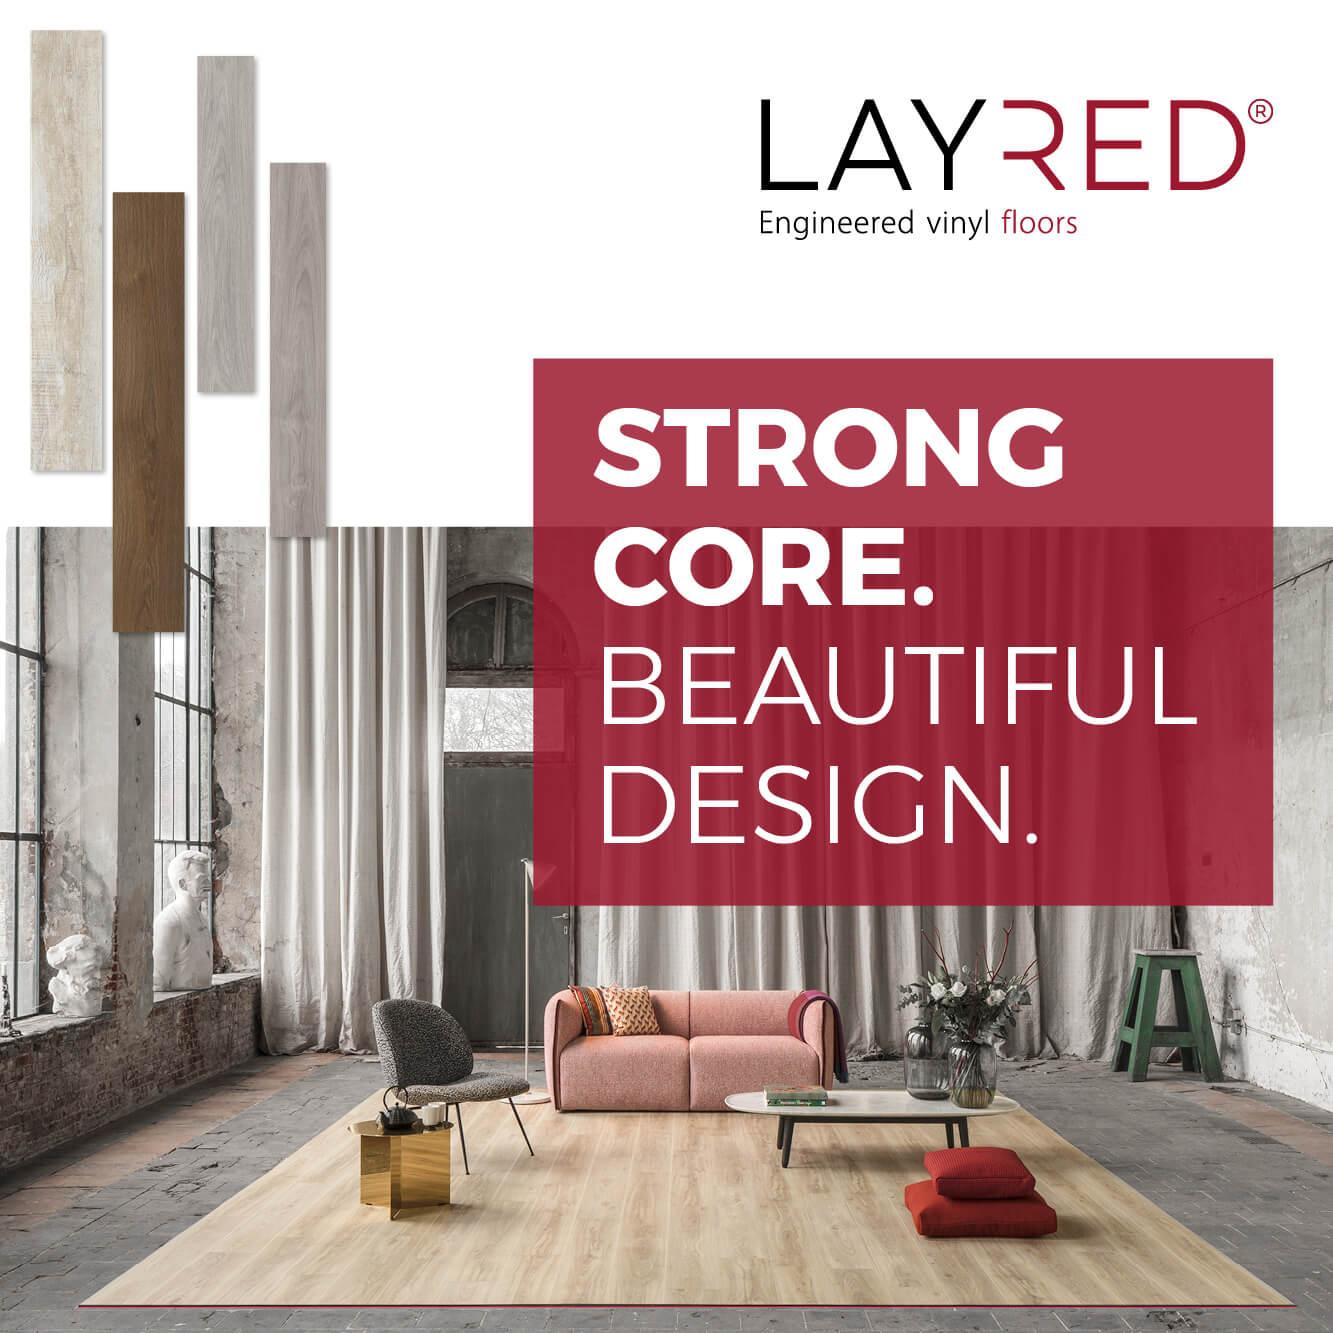 layred engineered vinyl flooring